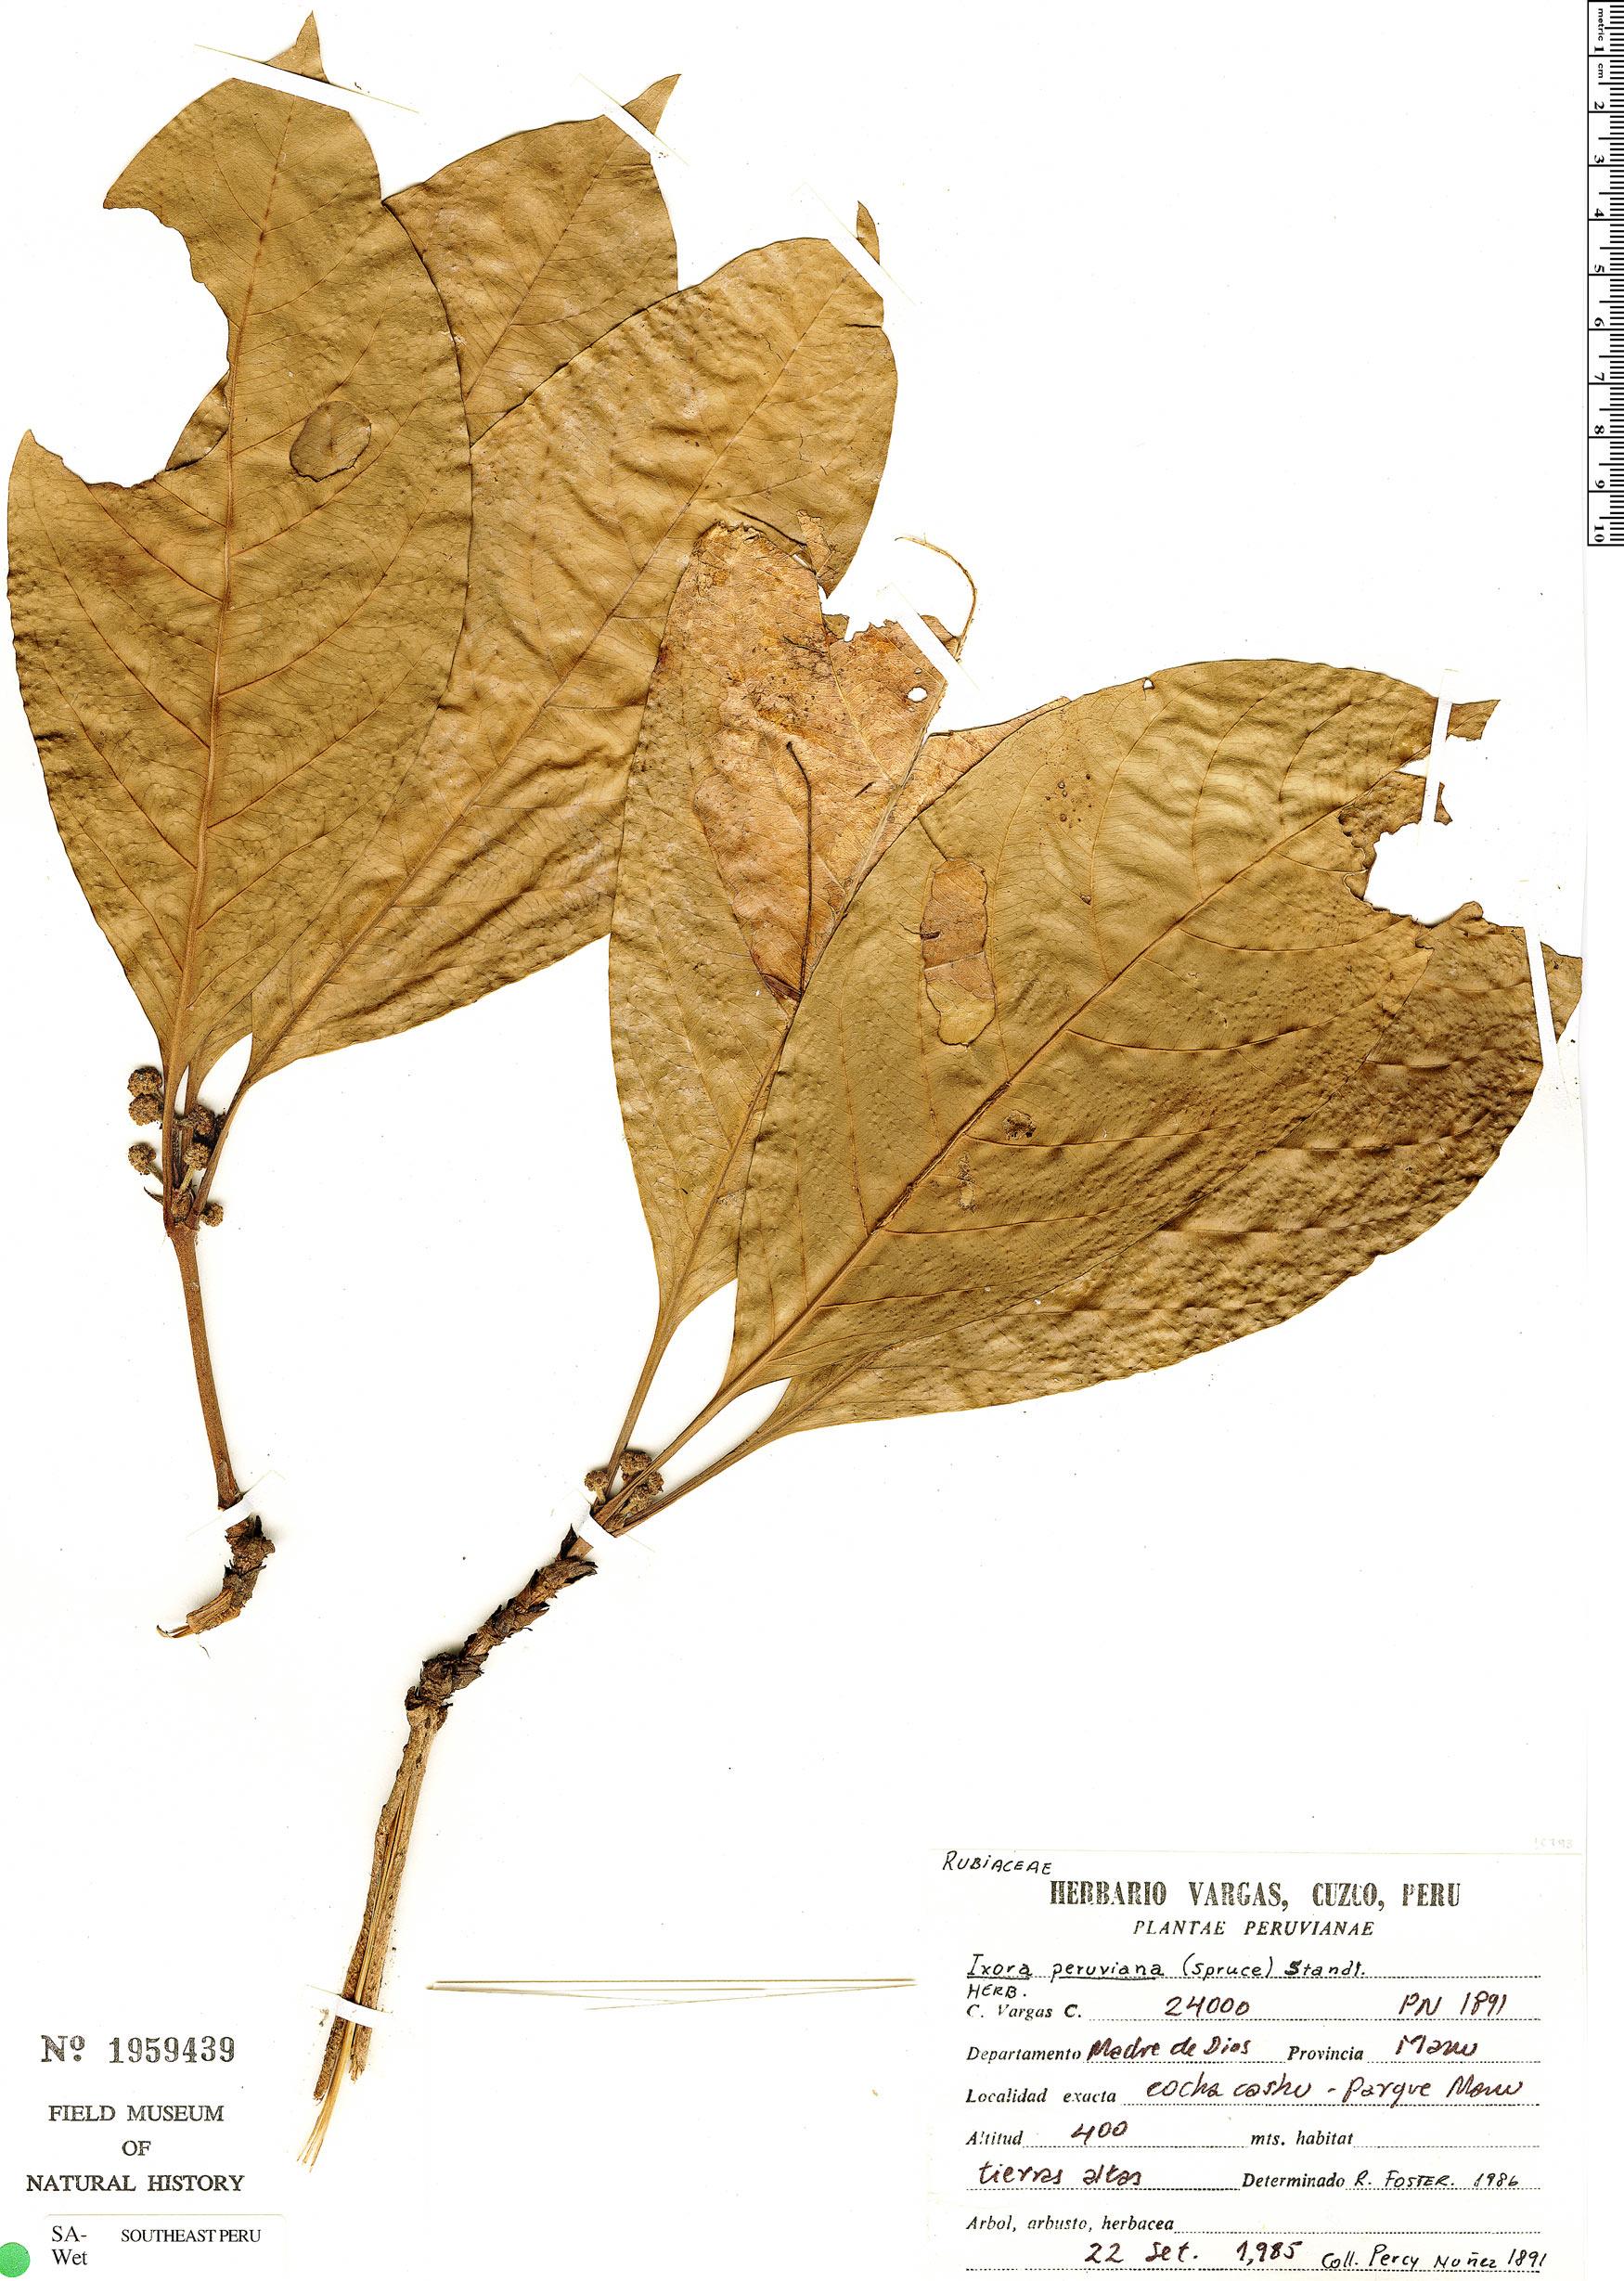 Specimen: Ixora peruviana